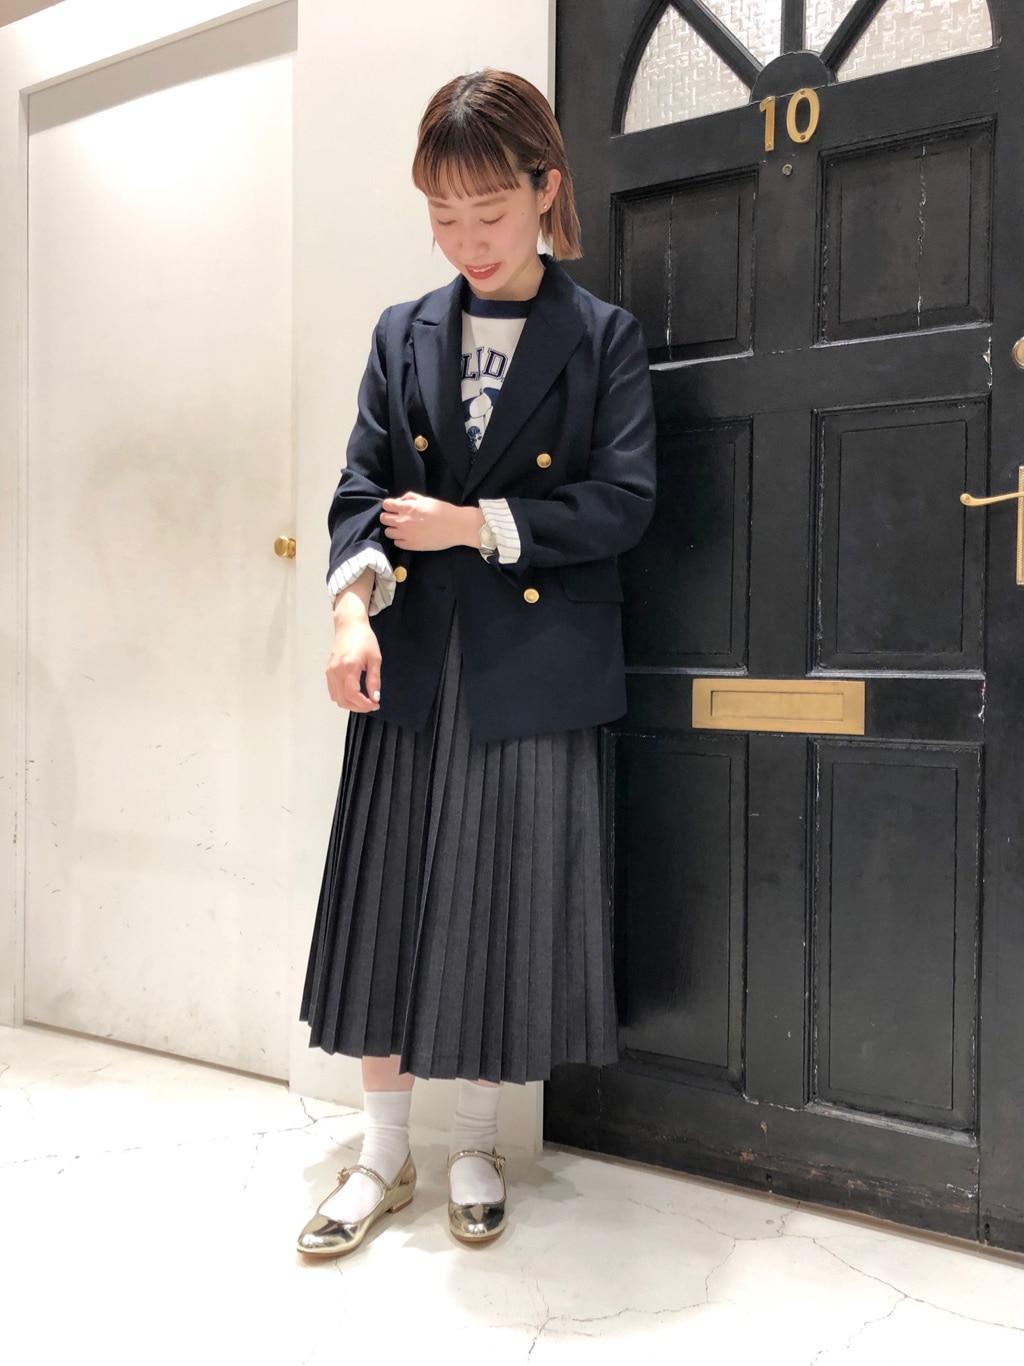 Dot and Stripes CHILD WOMAN ルクアイーレ 身長:157cm 2021.04.07